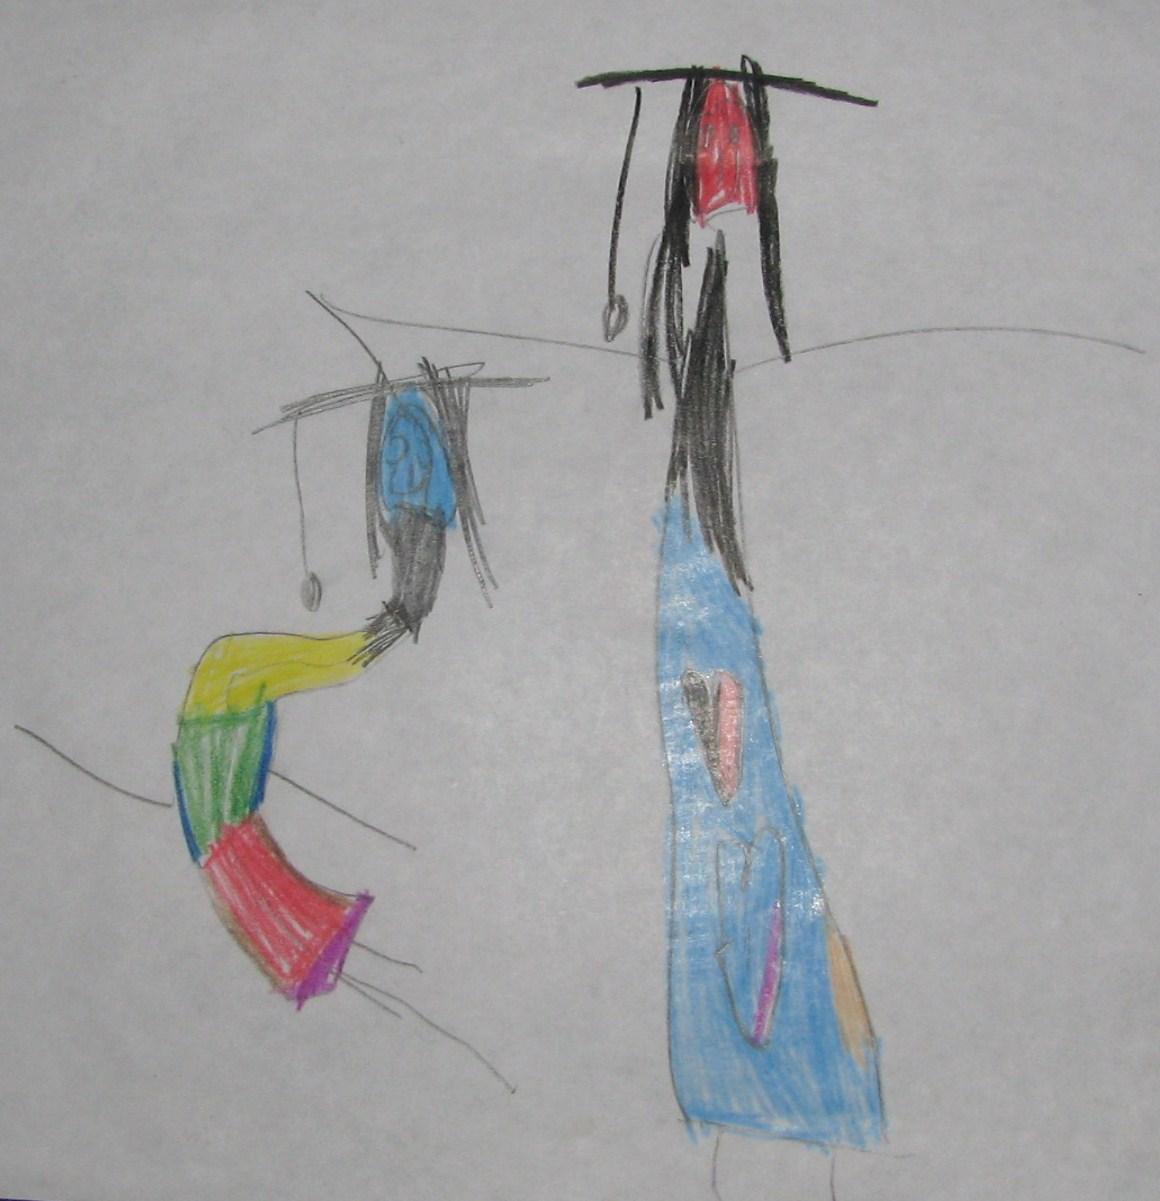 Amma and Amma Dancing By Chula, Mar2009